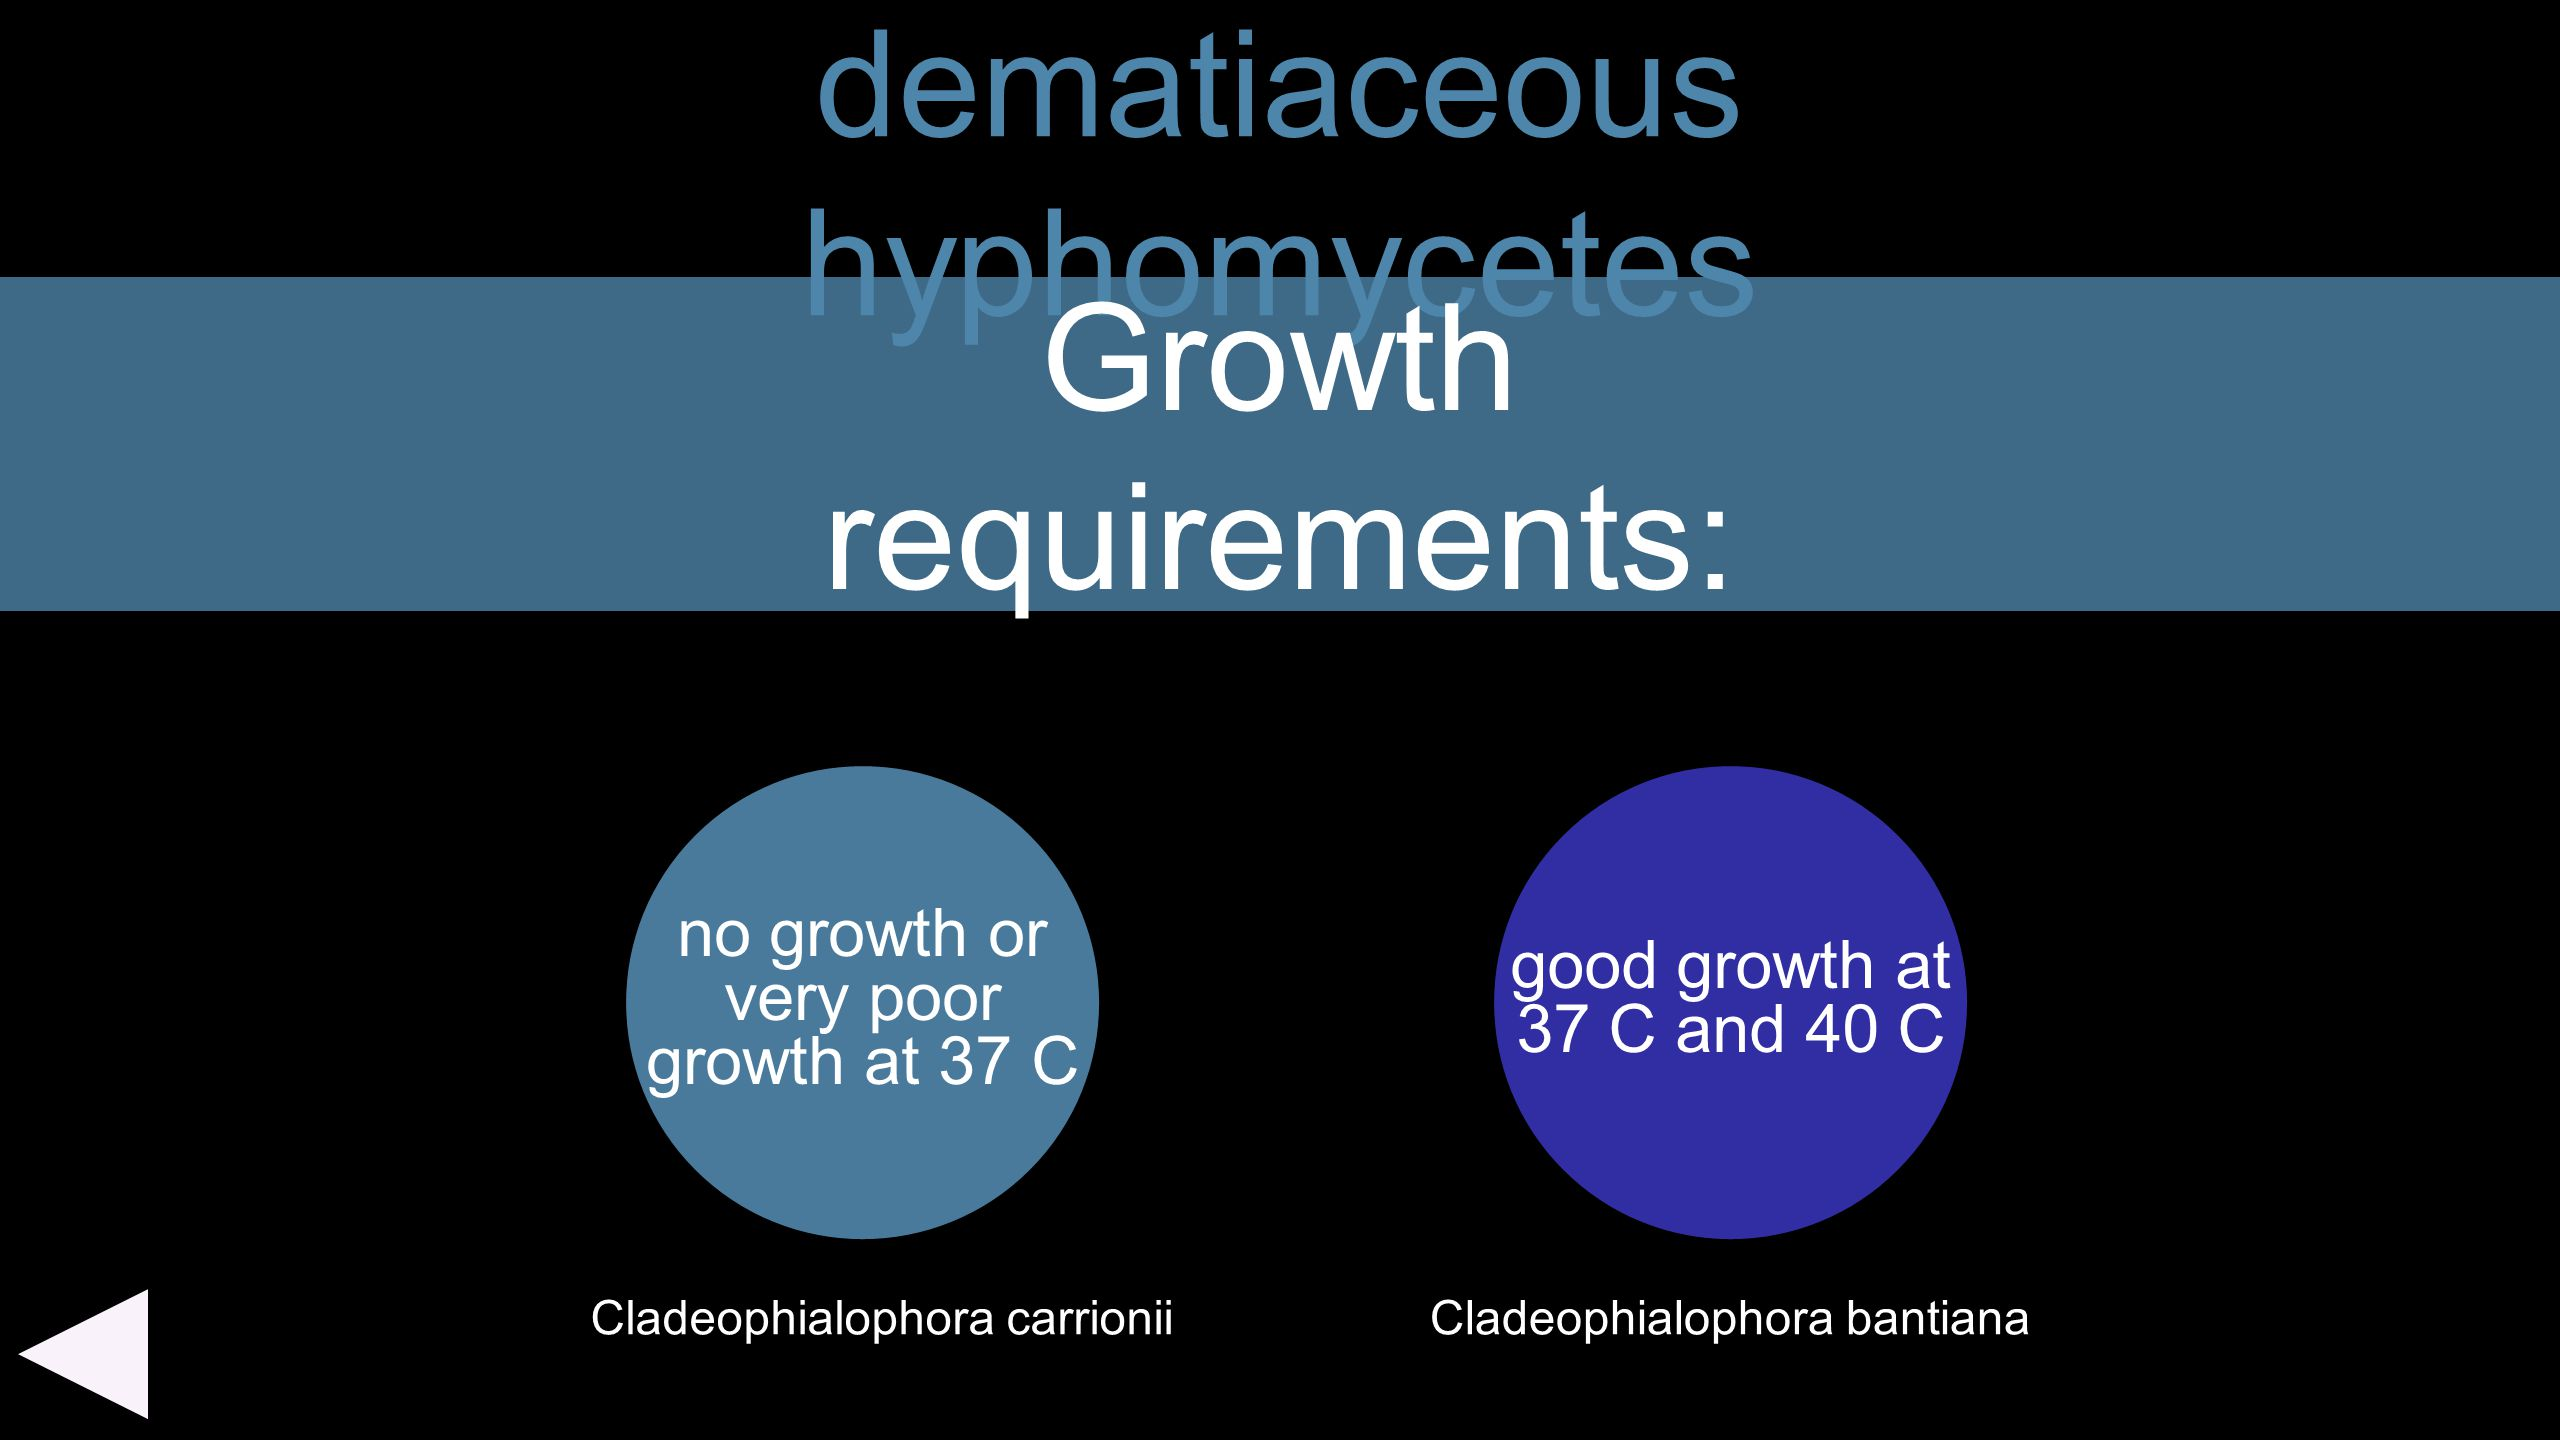 dematiaceous hyphomycetes